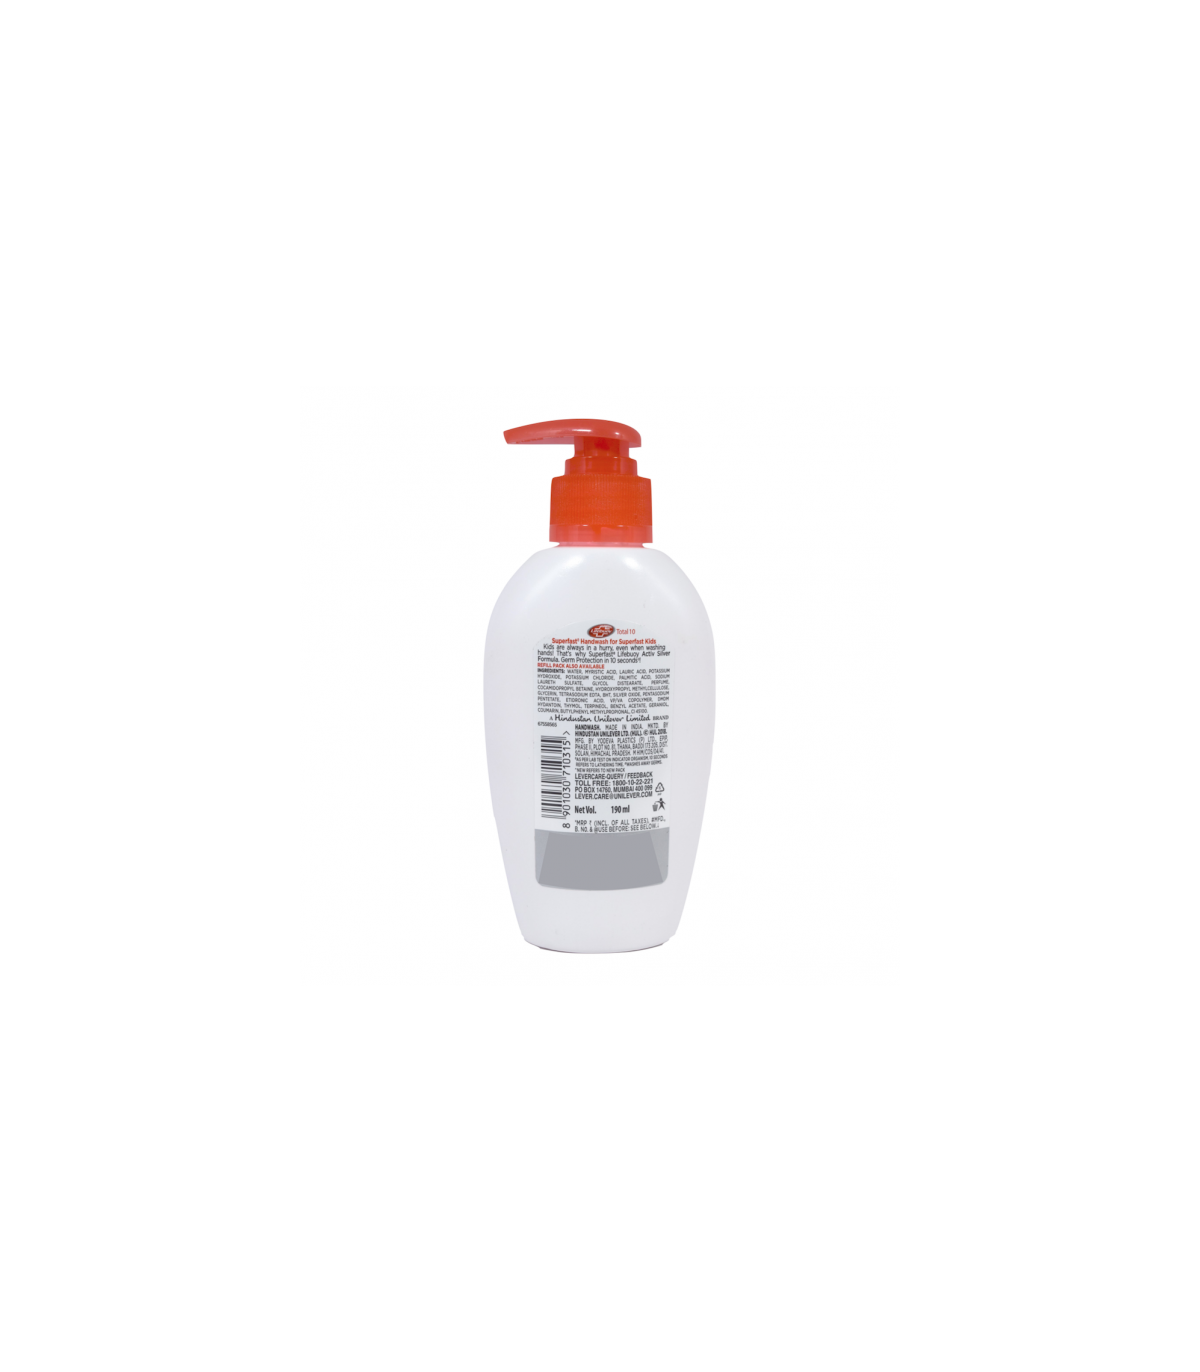 Lifebuoy مایع صابون توتال ده 190 میلی لیتر لایف بوی